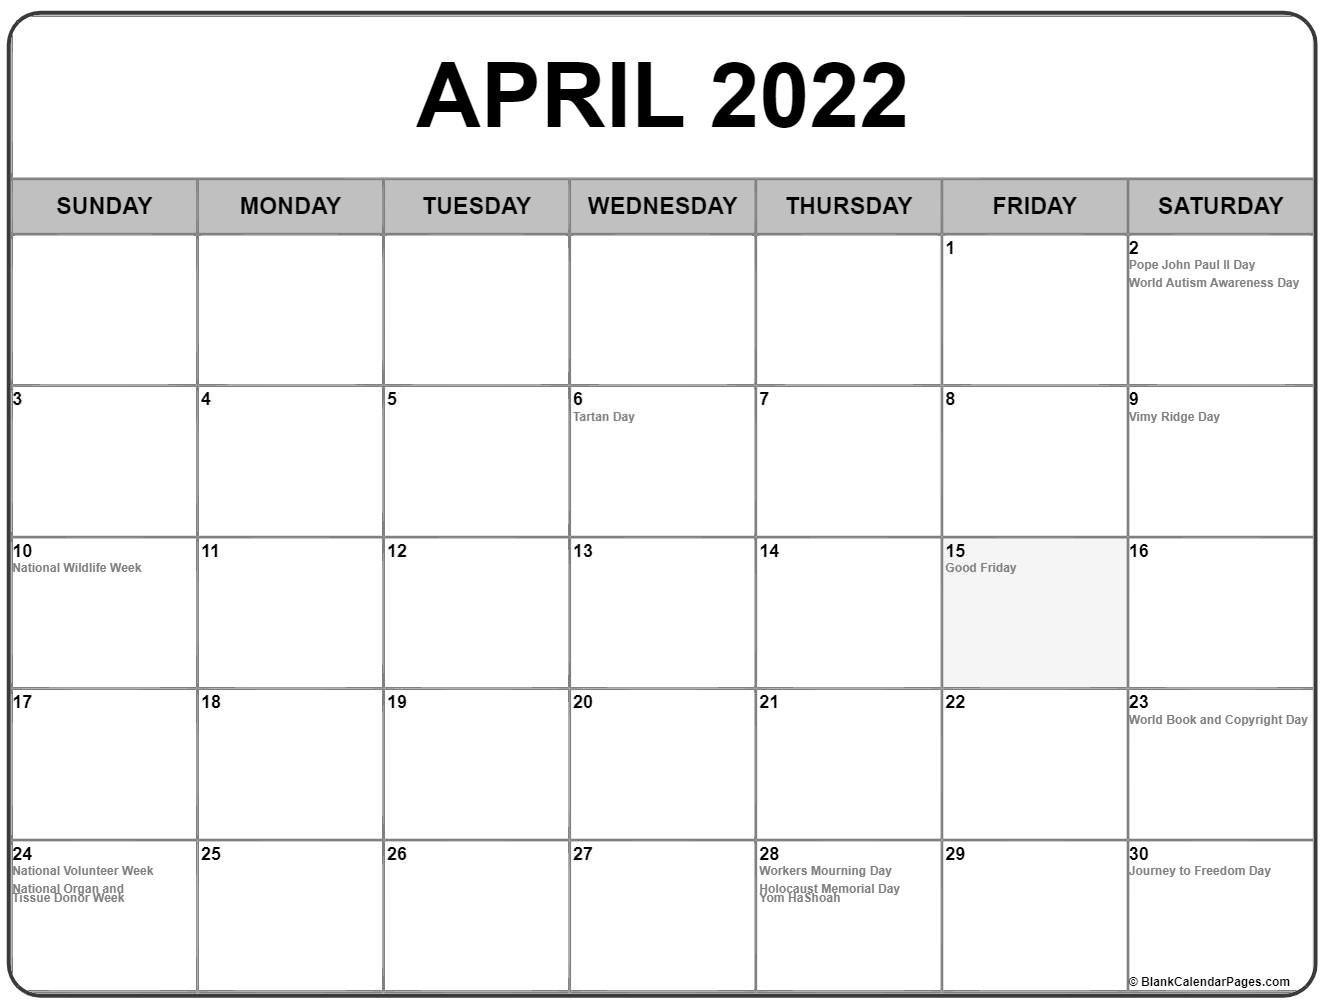 April 2022 Calendar With Holidays inside Calendar 2022 April Print Now Graphics